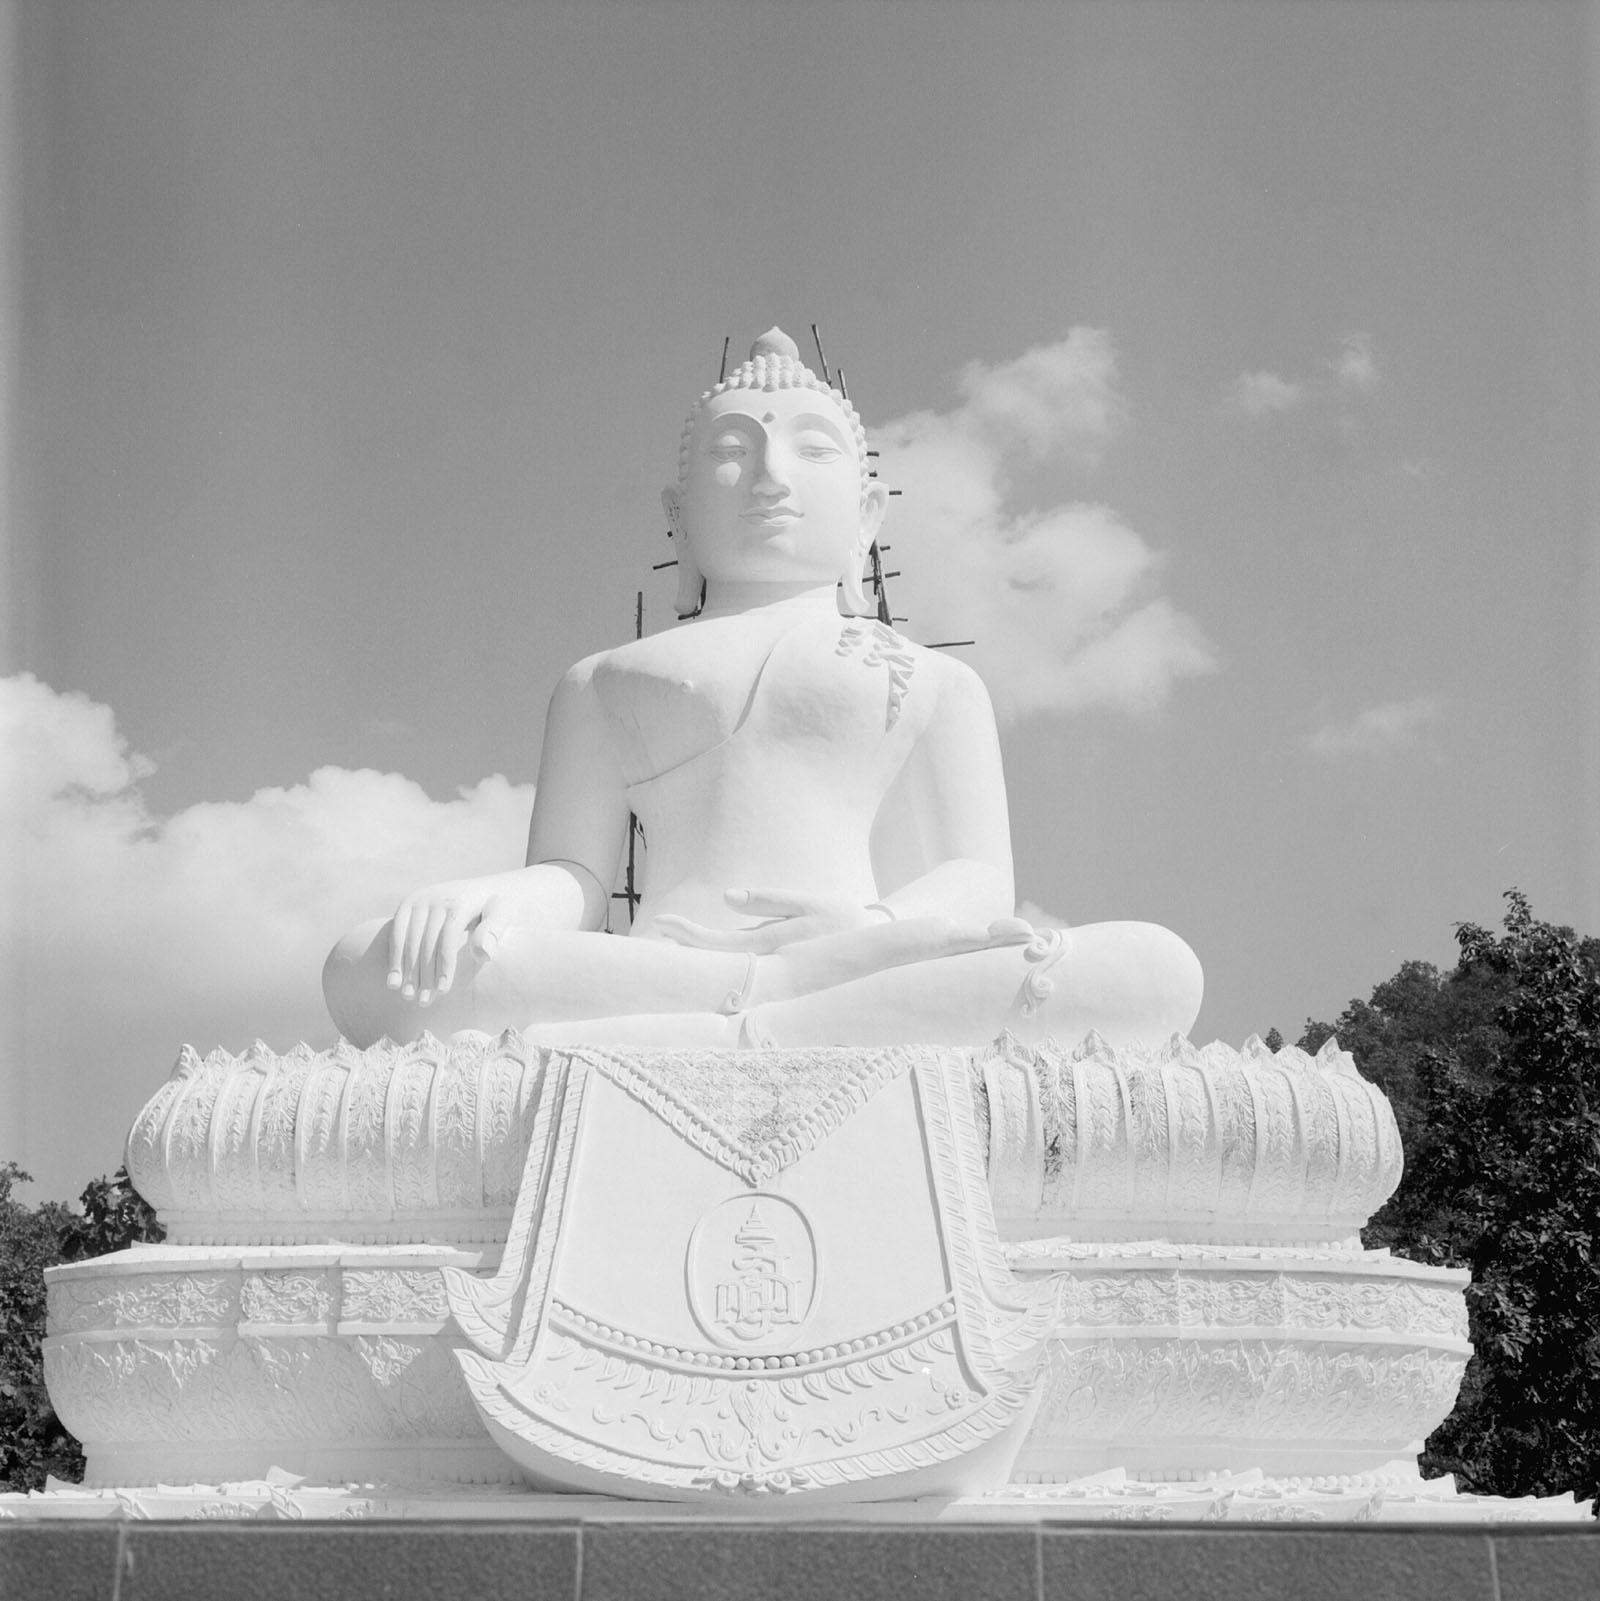 The White Buddha statue in Pai | Thailand Travel Photos